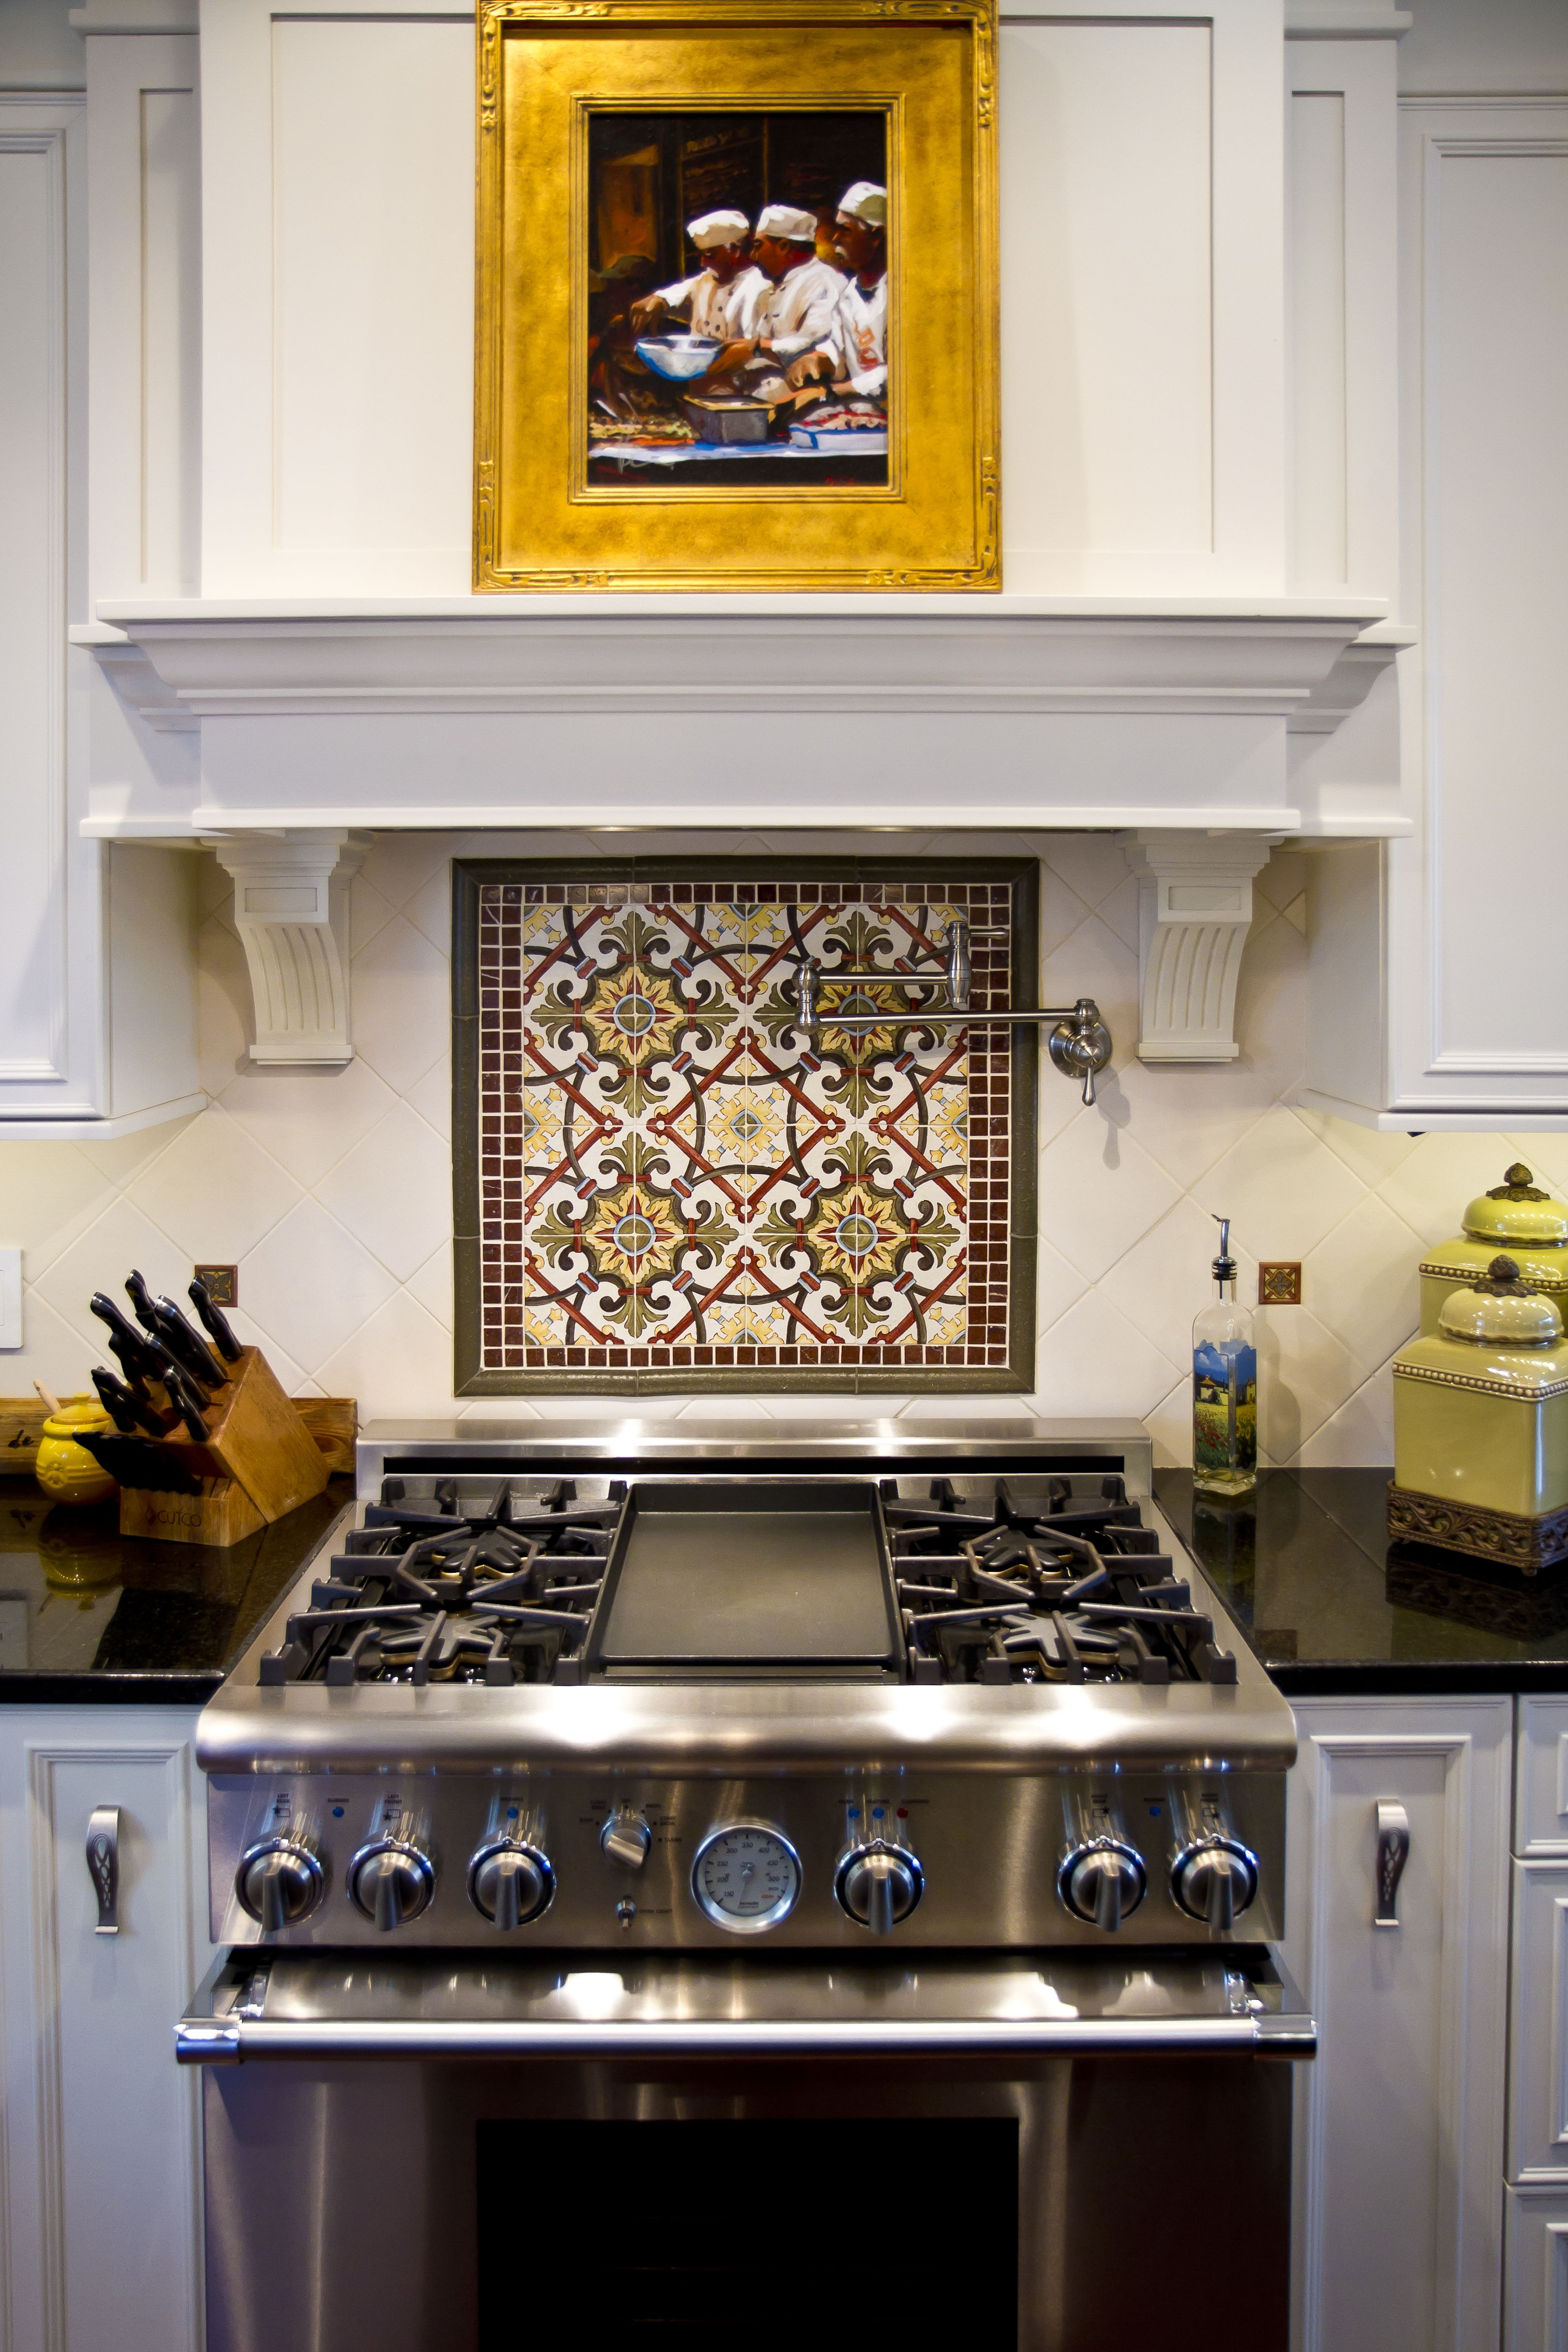 Kitchen Designed By Monarch Kitchen Bath Range Hood And Backsplash Detail Monarchkitchenandbathdes Classic Kitchens Kitchen Remodel Kitchen And Bath Design